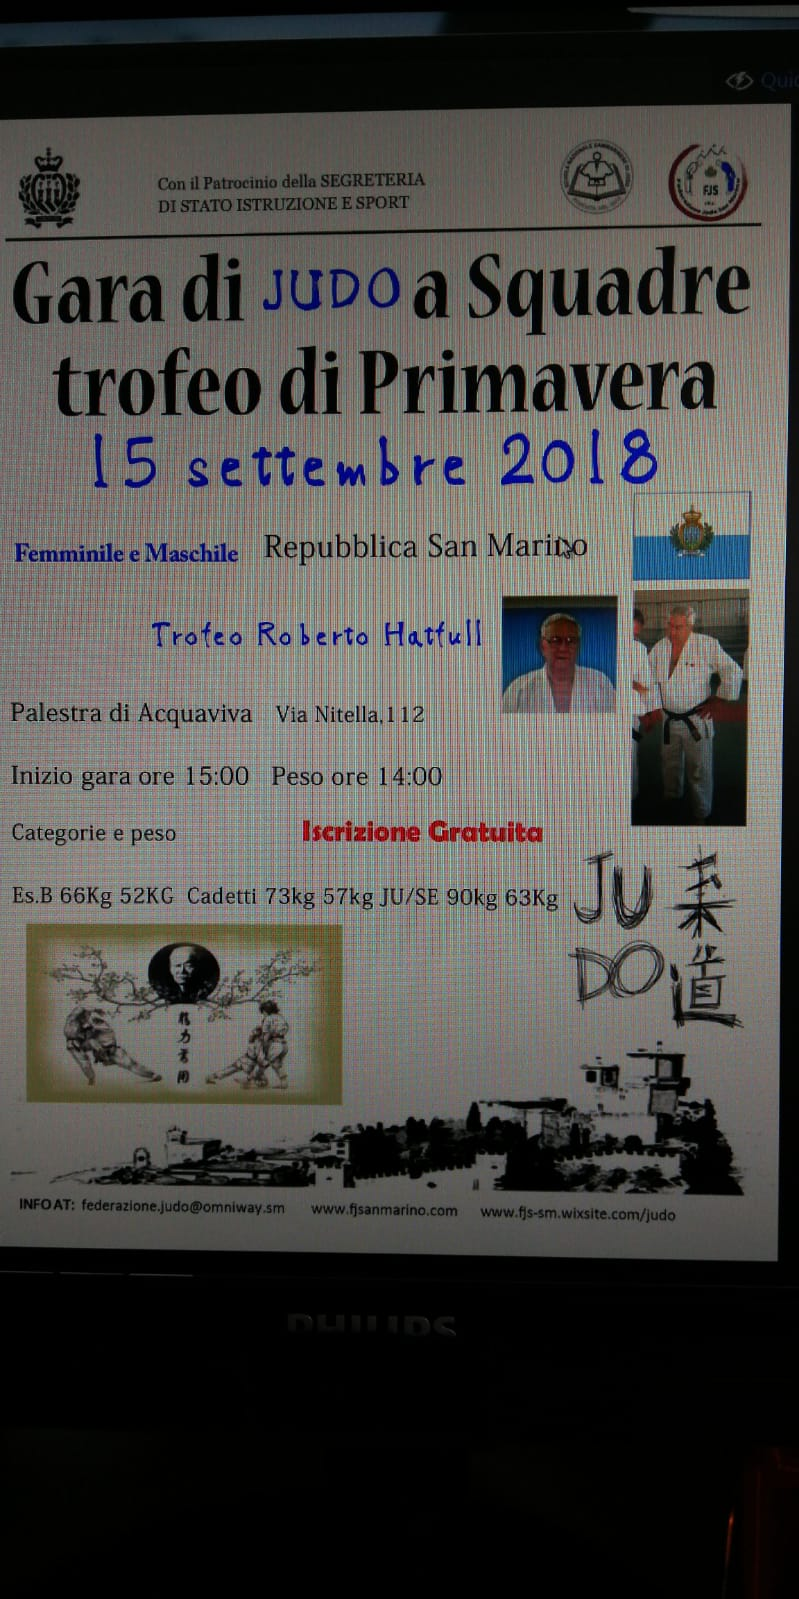 Judo: all'Acquaviva Hall, il Torneo Roberto Hatfull